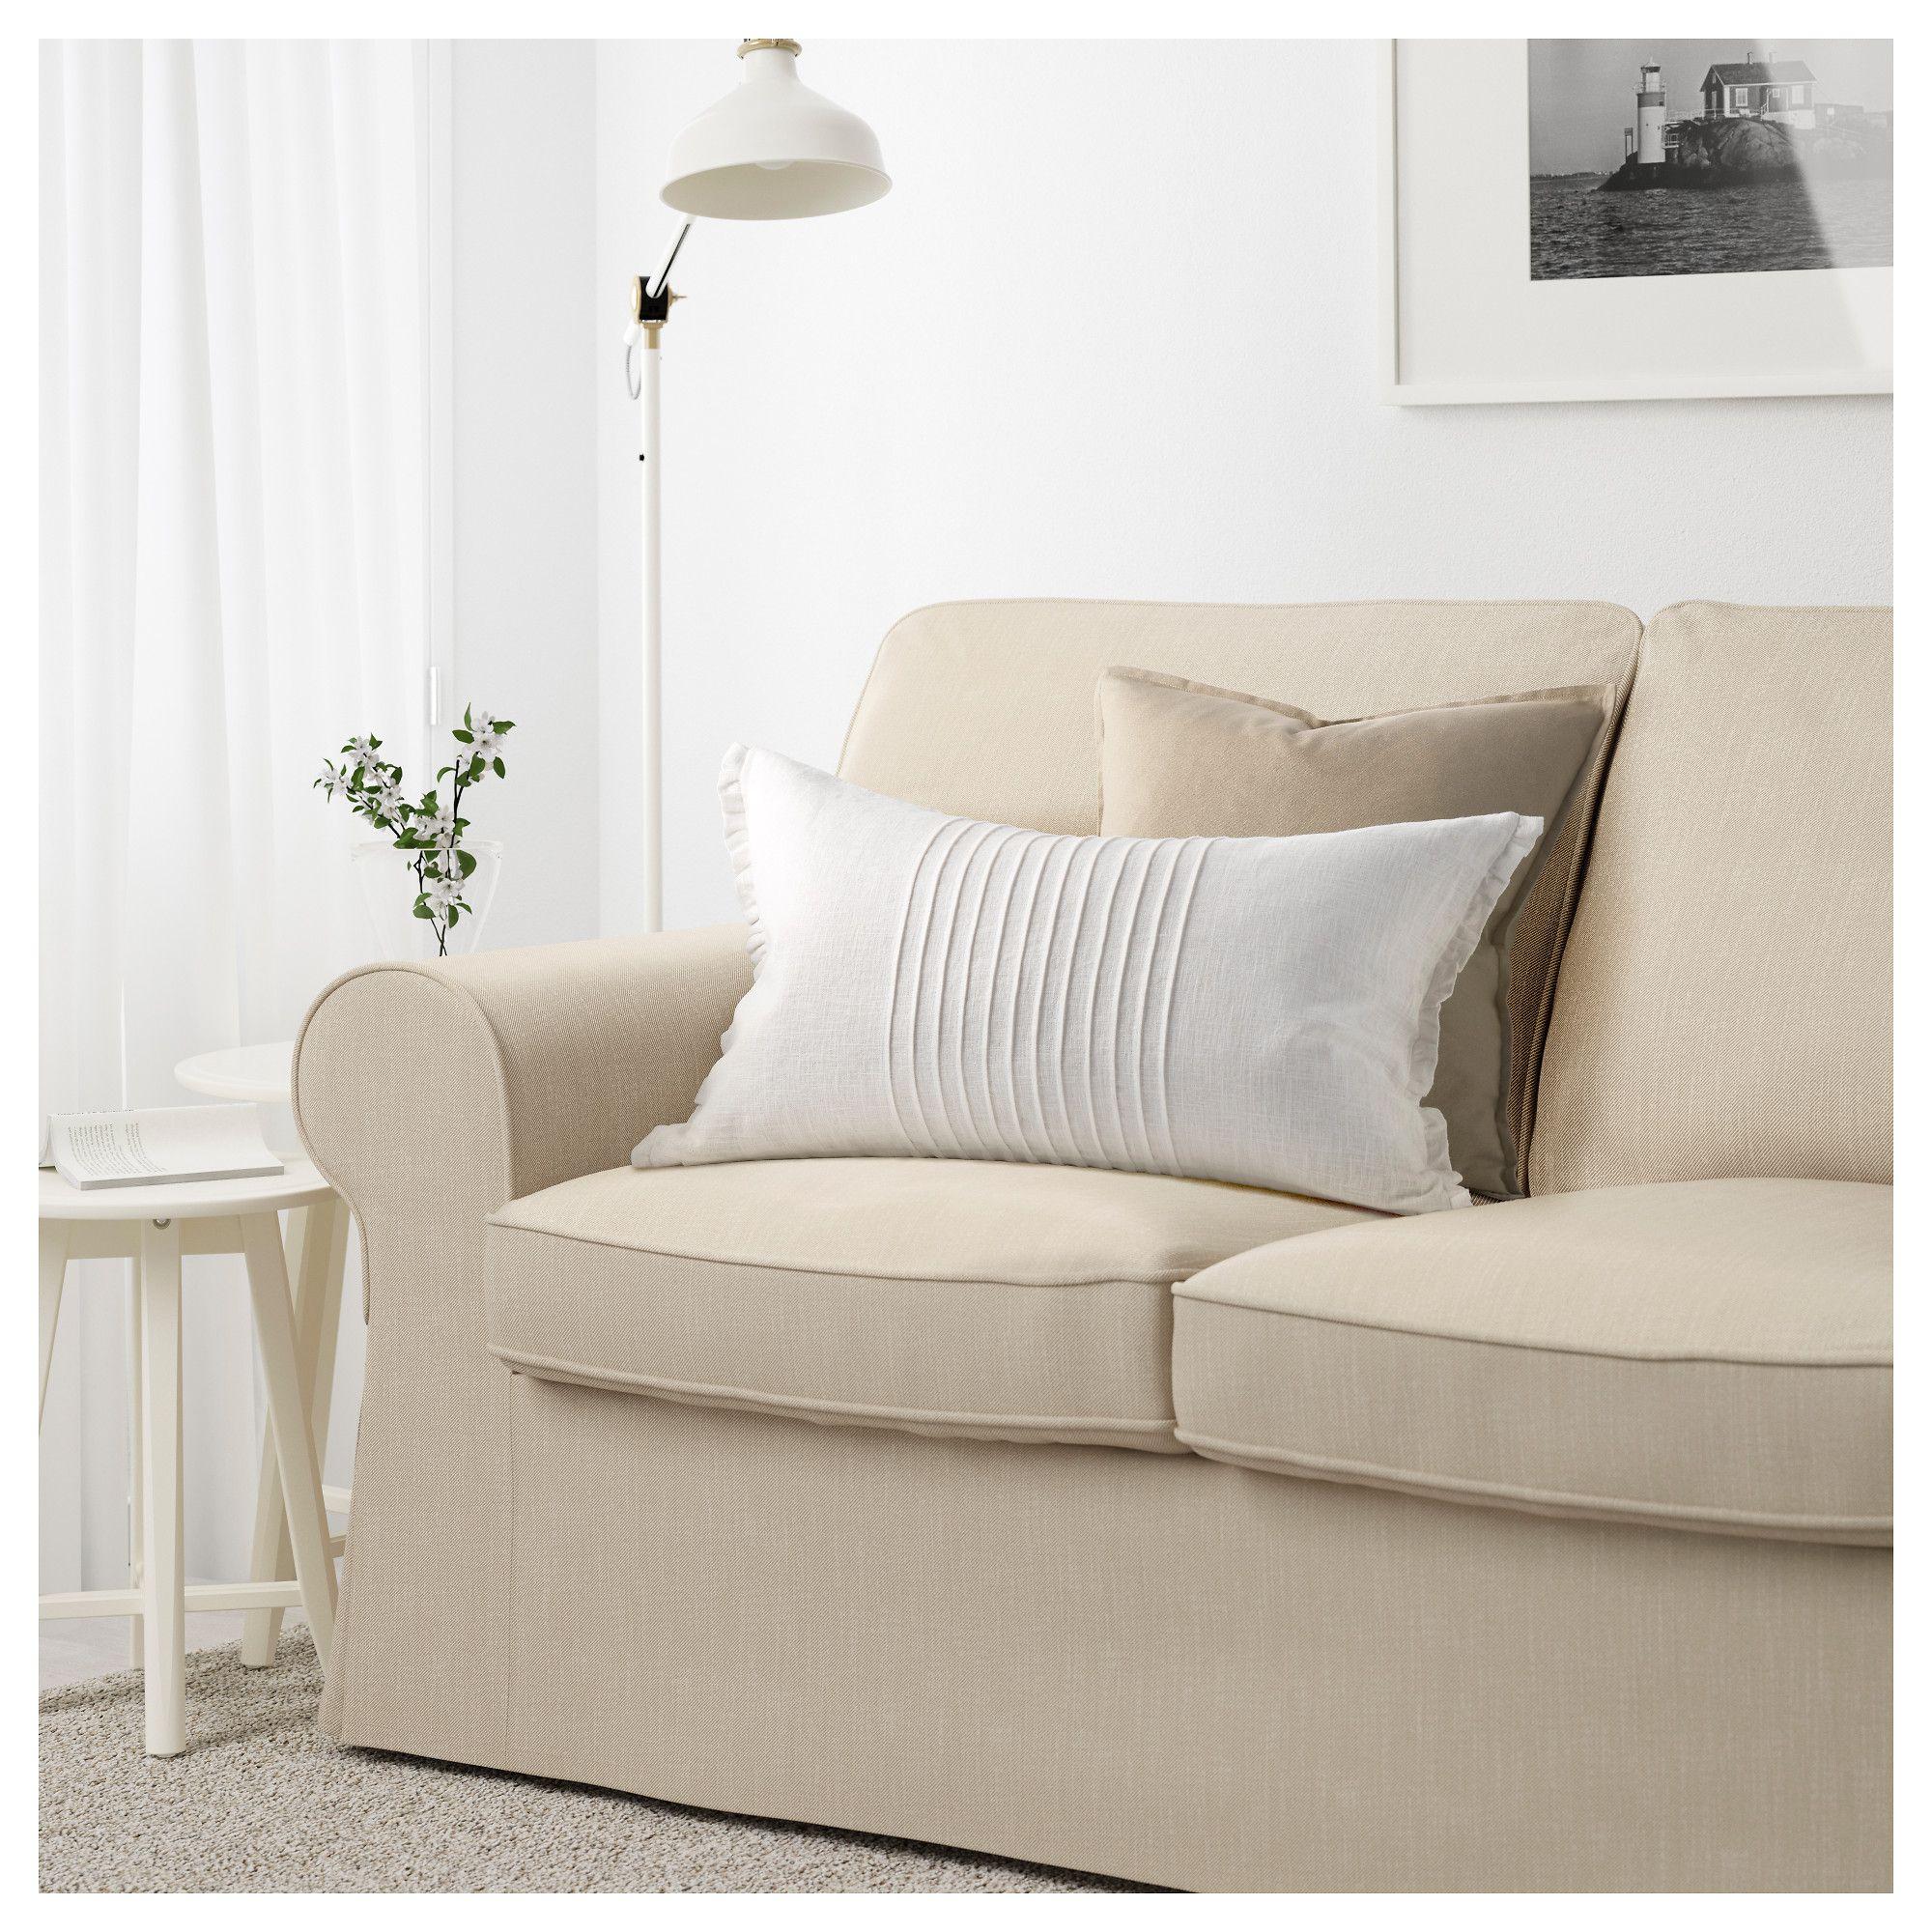 10 Ektorp 3 Seater Sofa Cover Most Incredible And Also Gorgeous Ektorp Sofa Cover Ektorp Sofa Ikea Ektorp Sofa